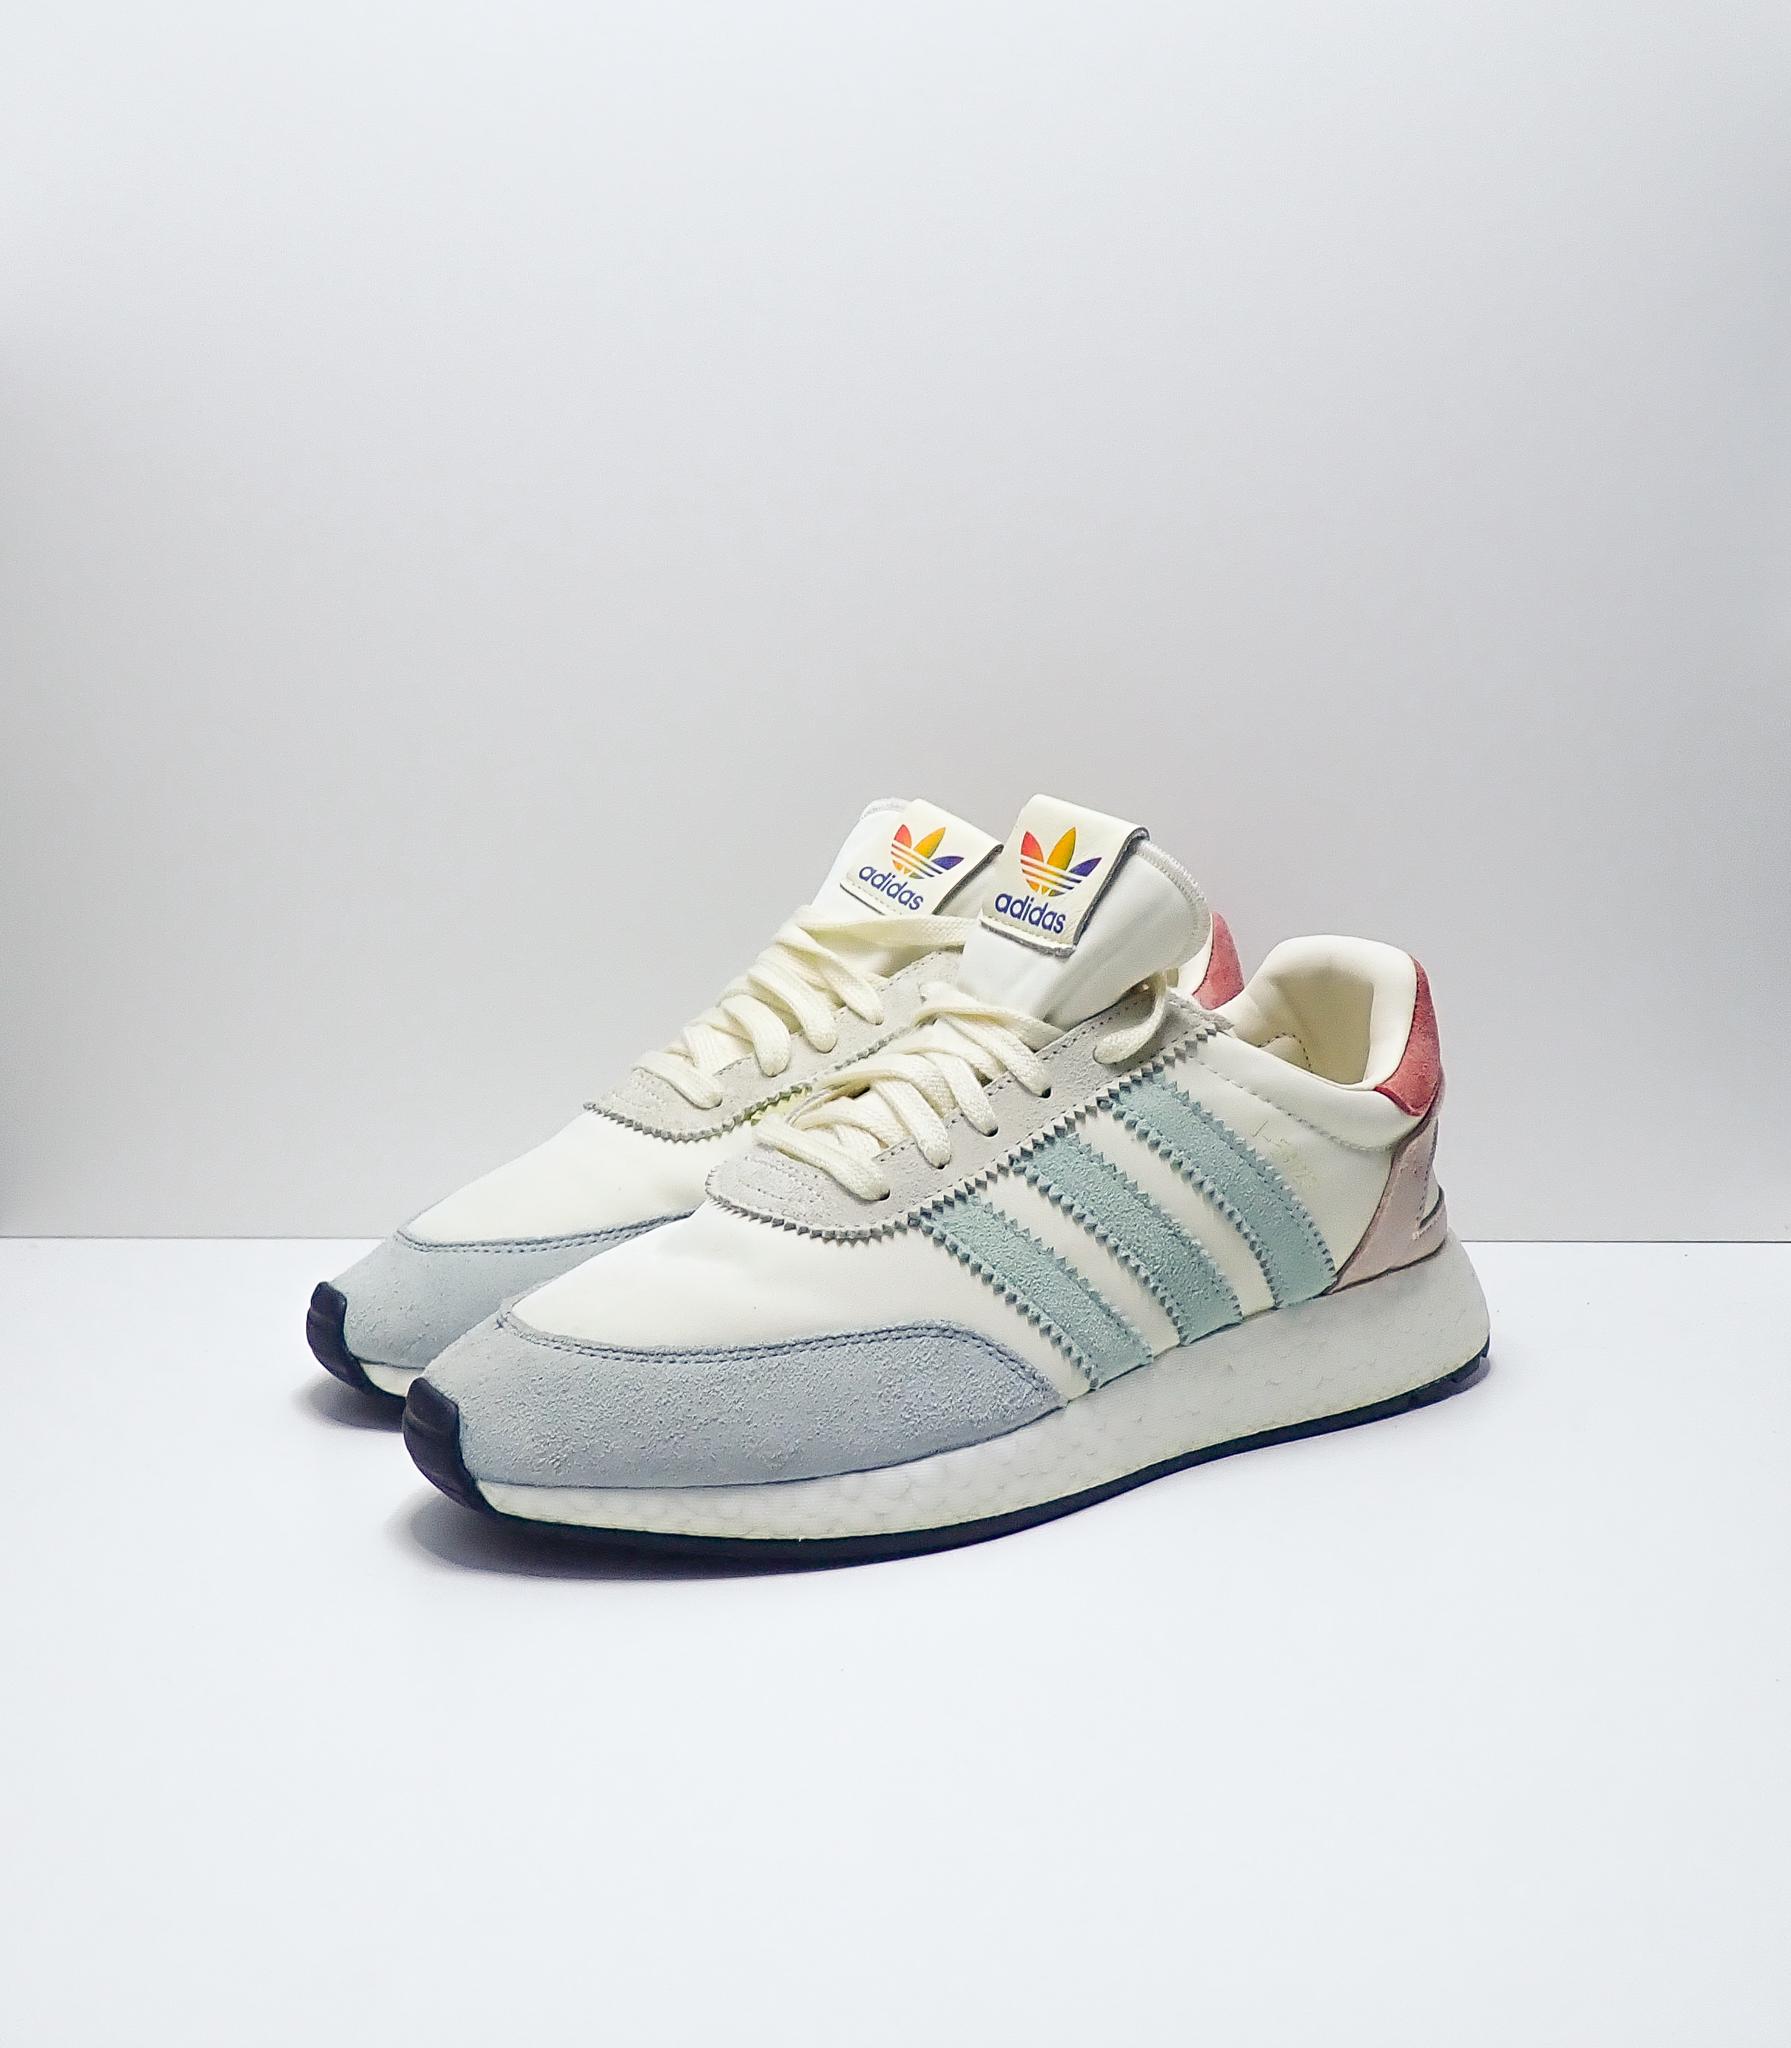 Adidas I-5923 Pride Pack (2018)